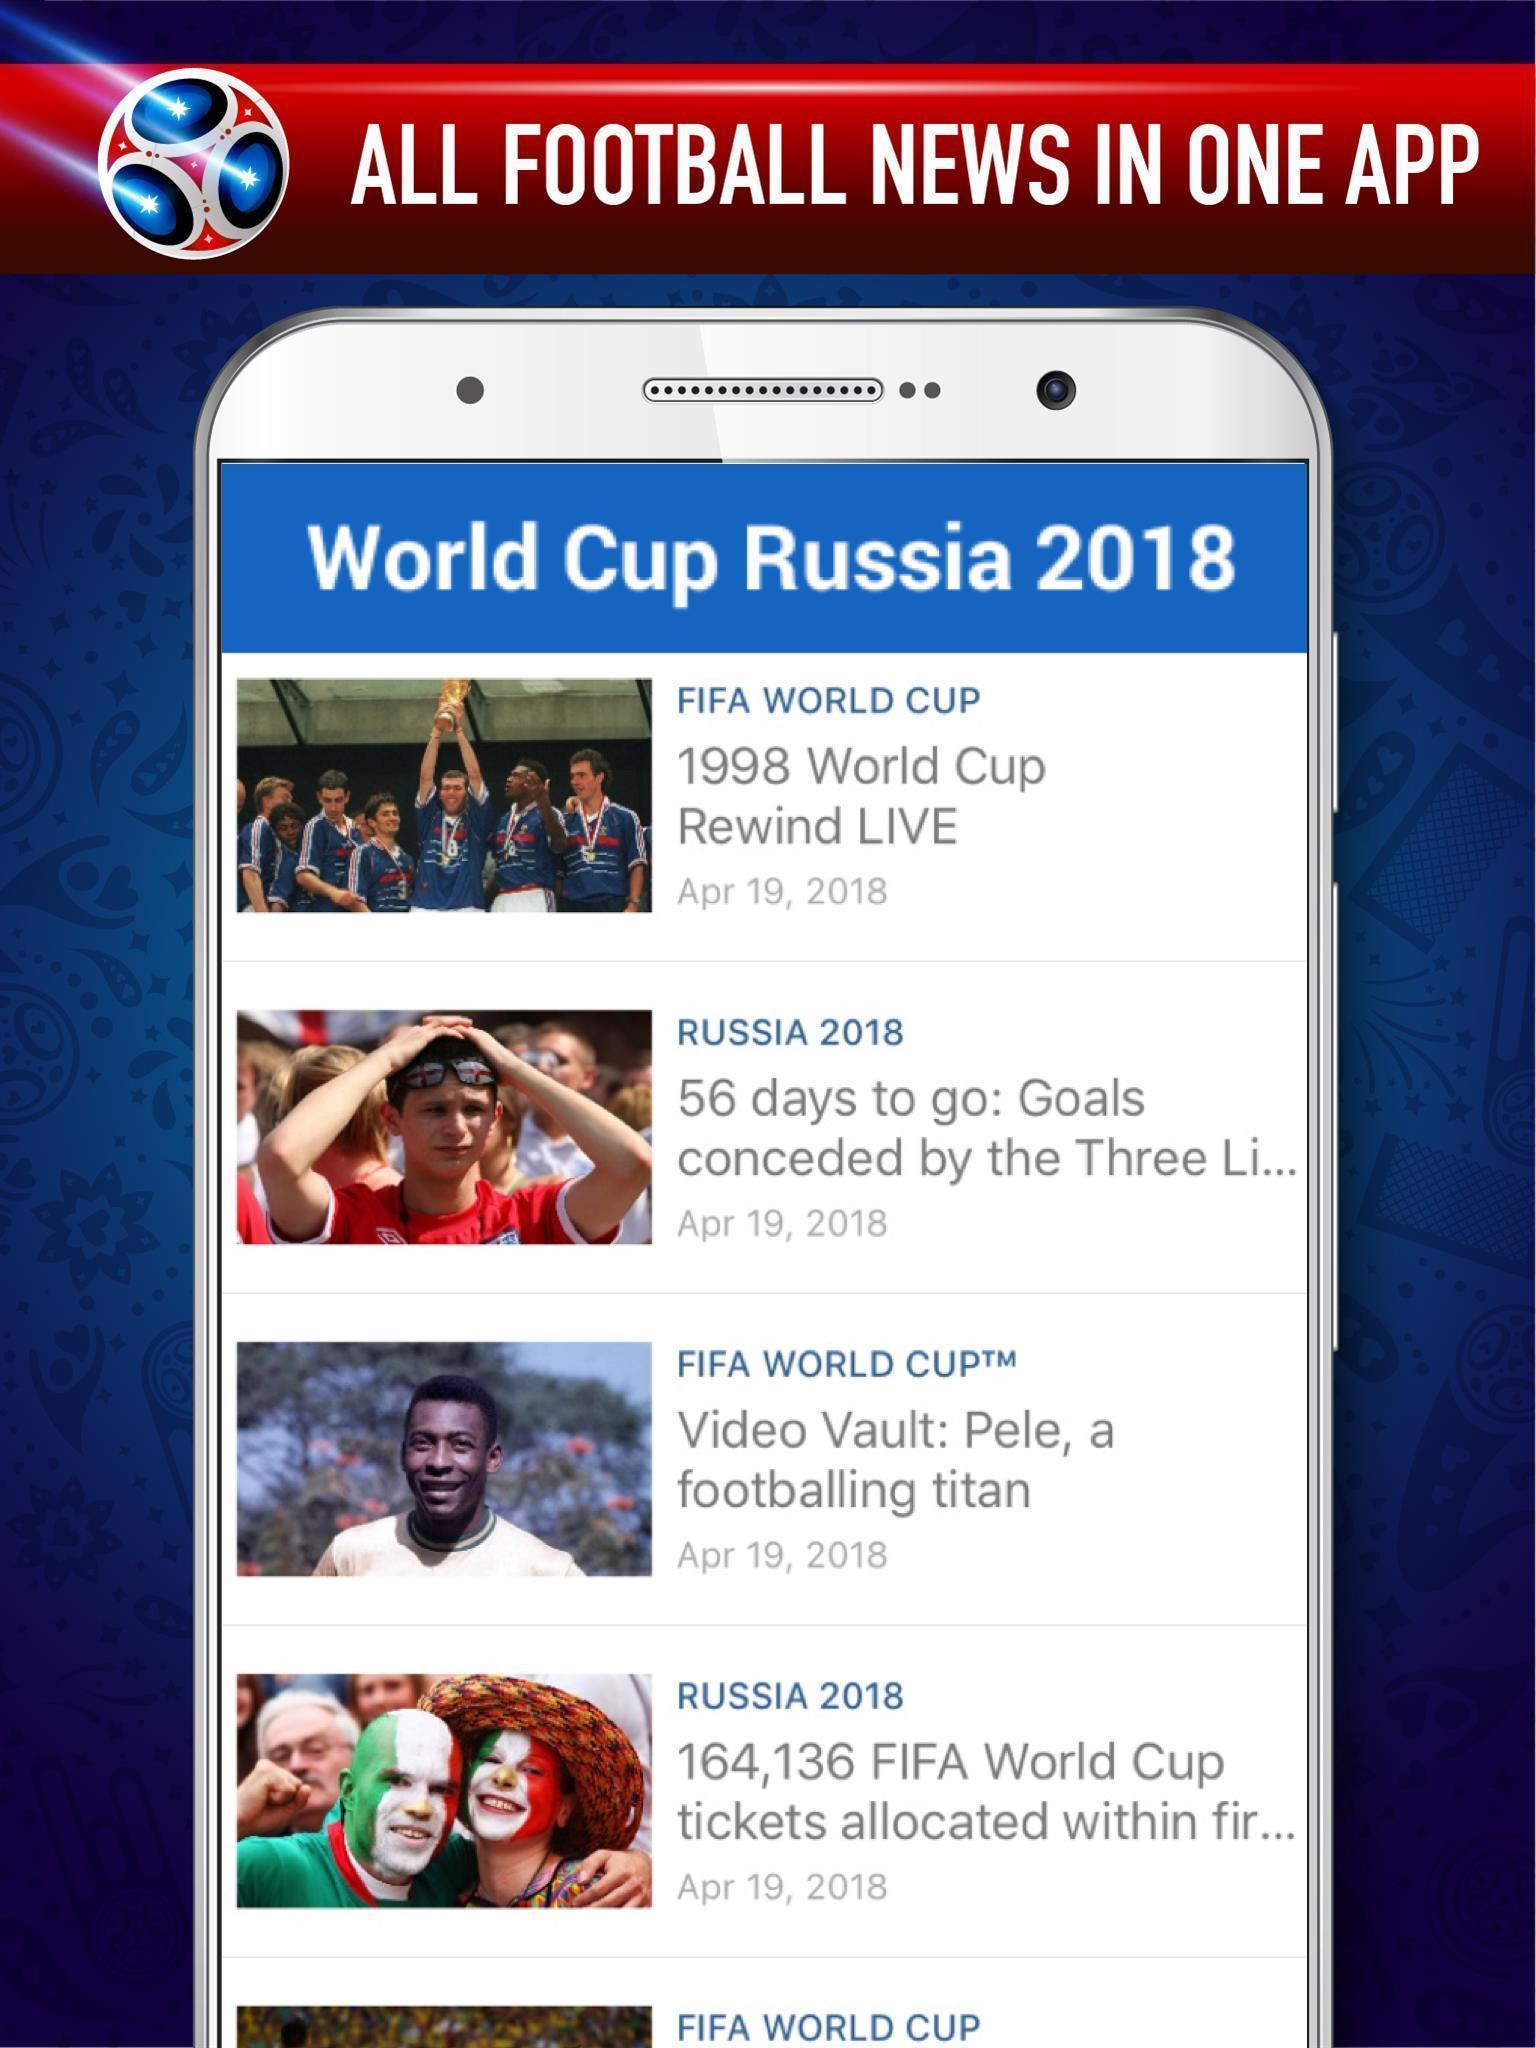 Calendario Mundial Futbol.Copa Mundial De Futbol 2018 Rusia Calendario For Android Apk